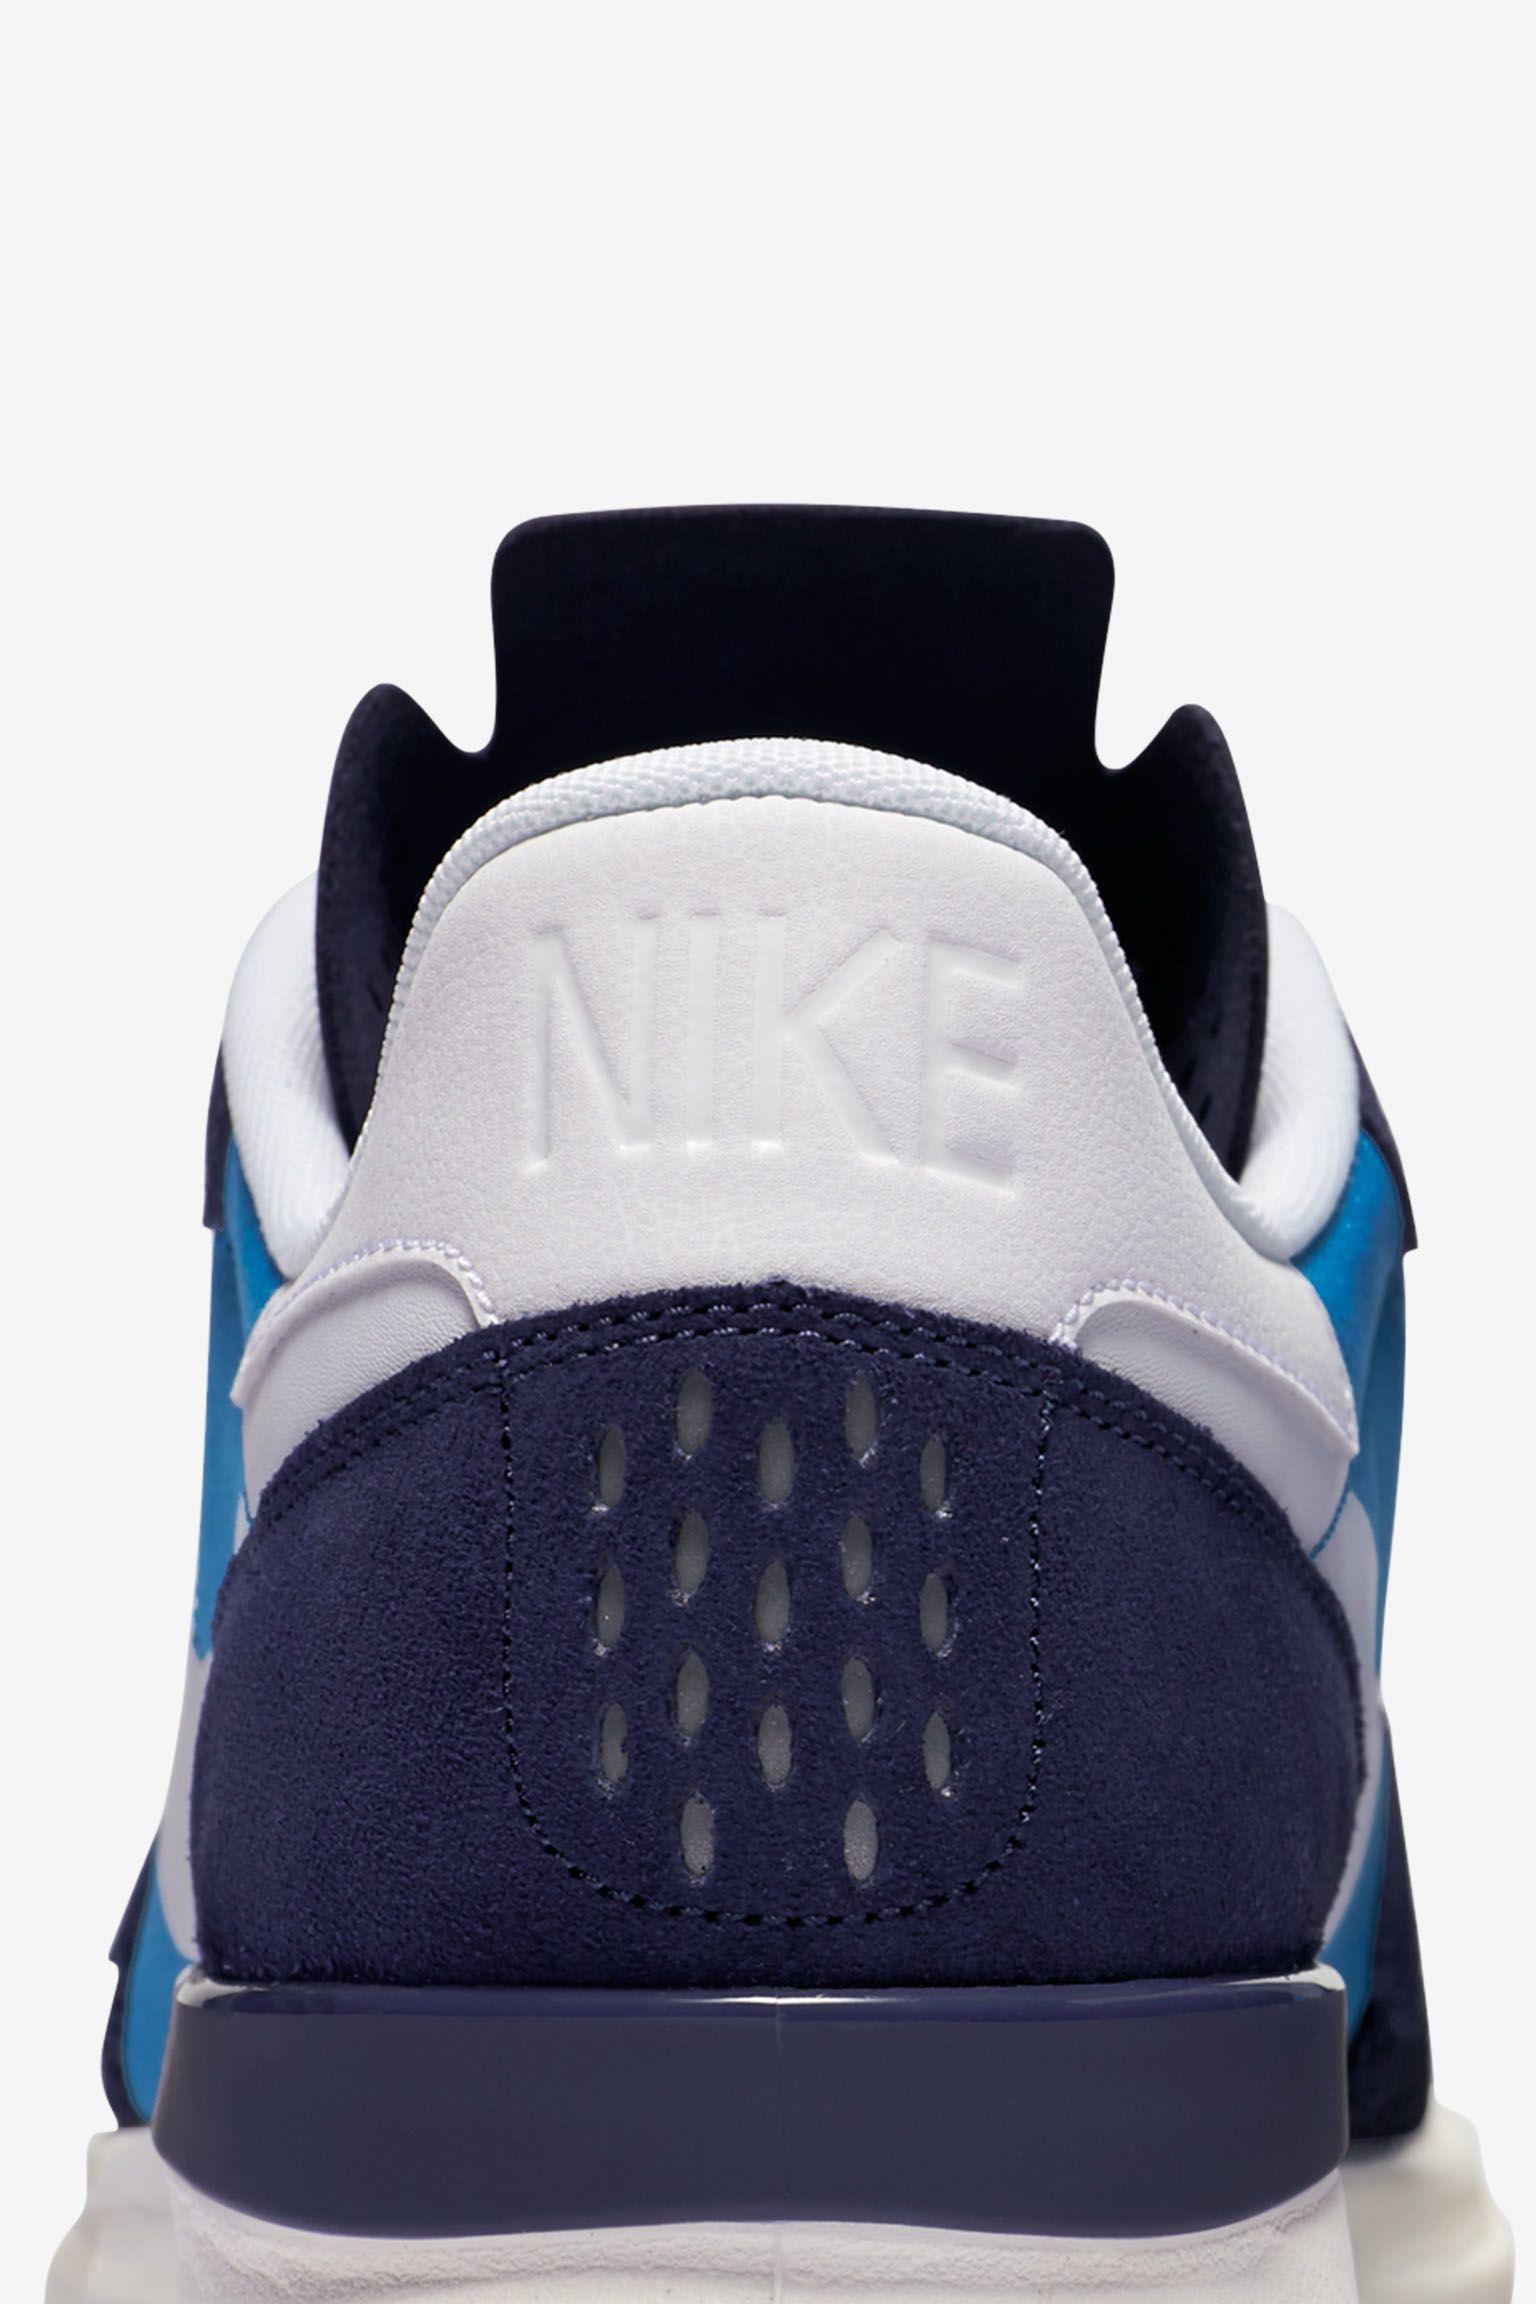 Nike Air Berwuda 'Blitz Blue & White'